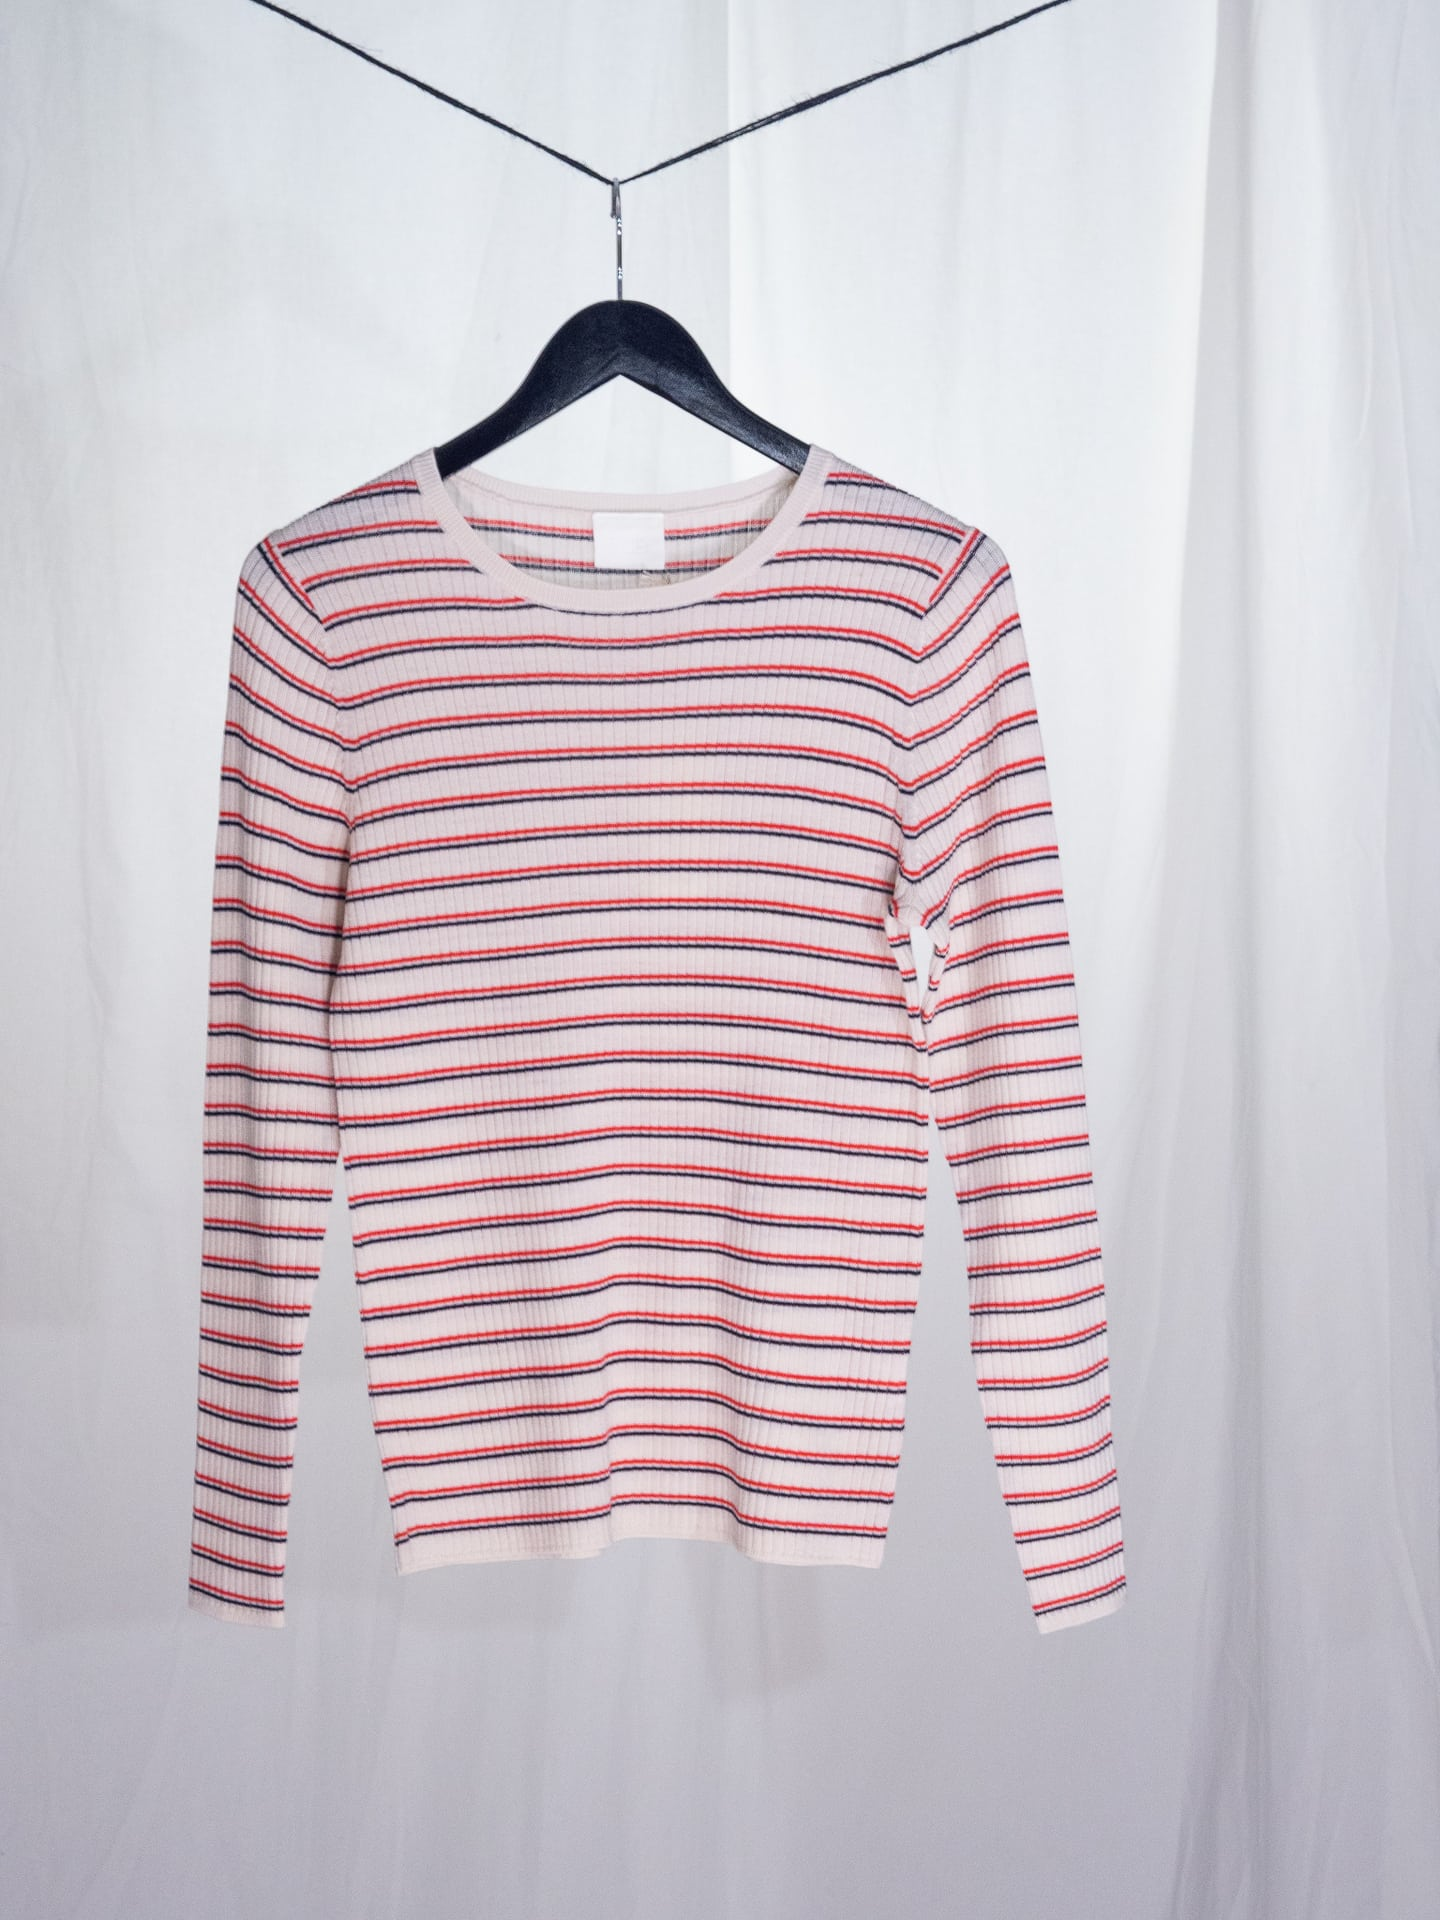 Wool rib blouse, ecru/navy/red